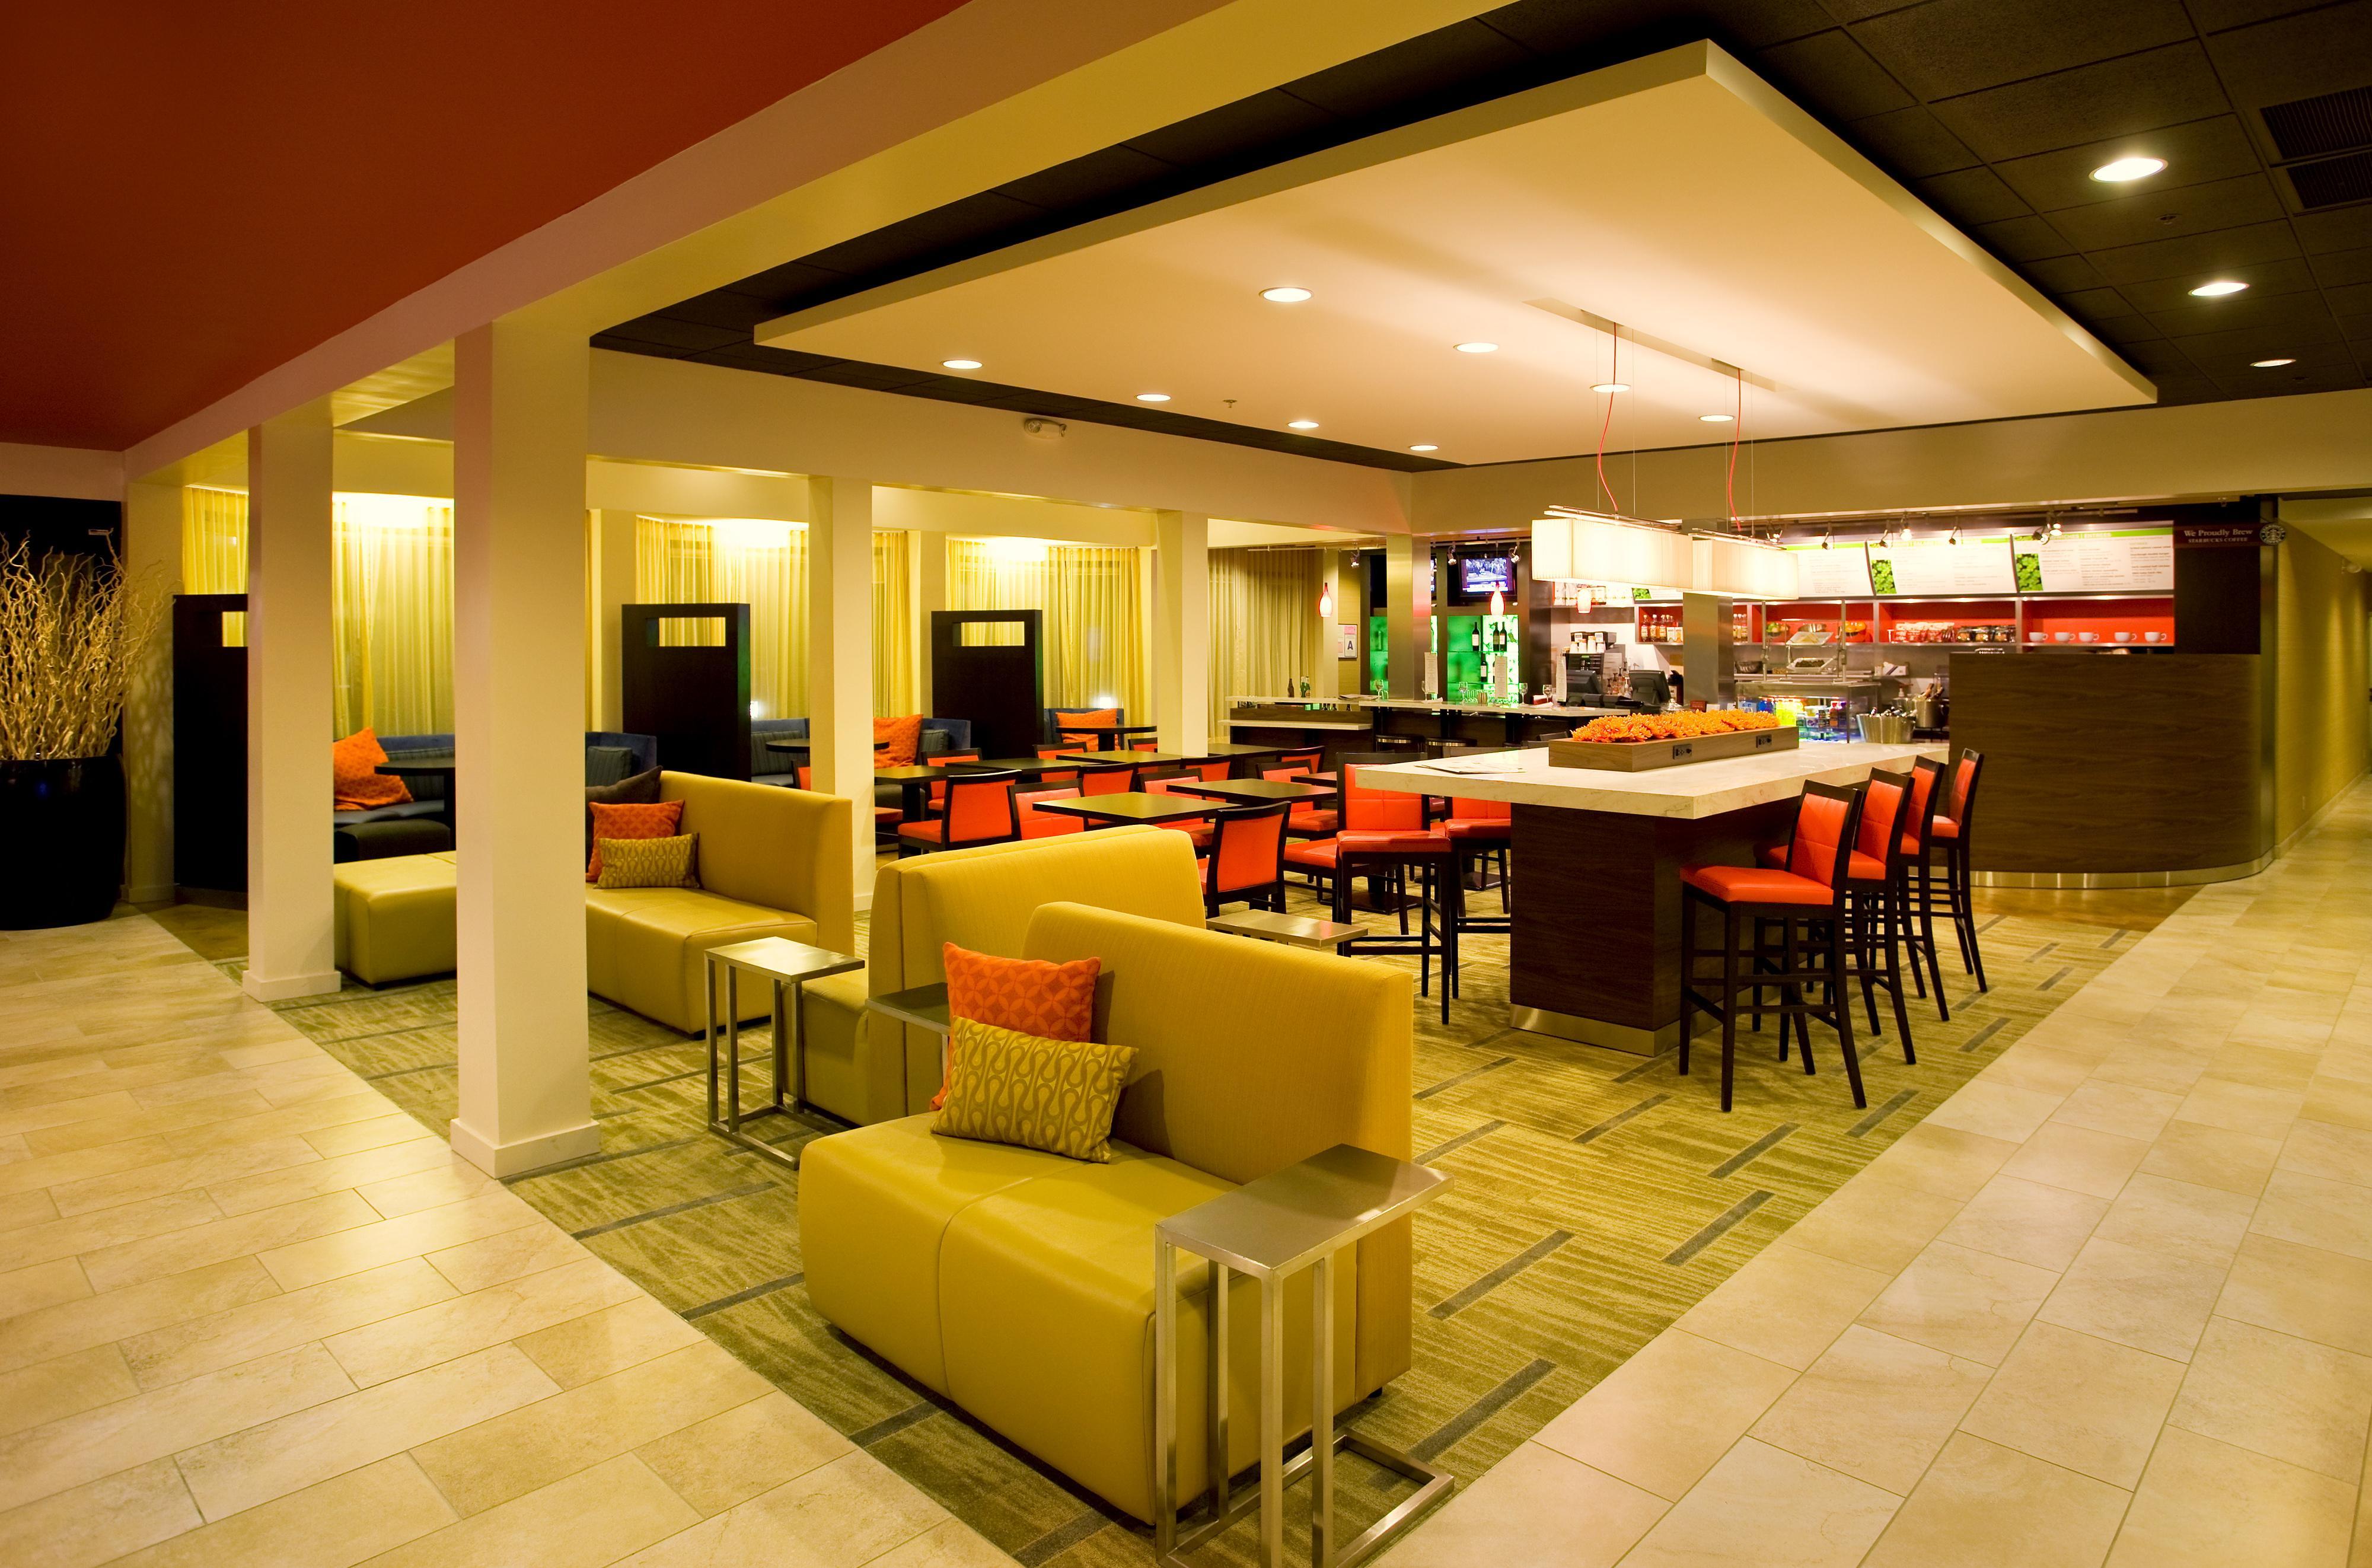 Sorrento Valley Food Court Starbucks